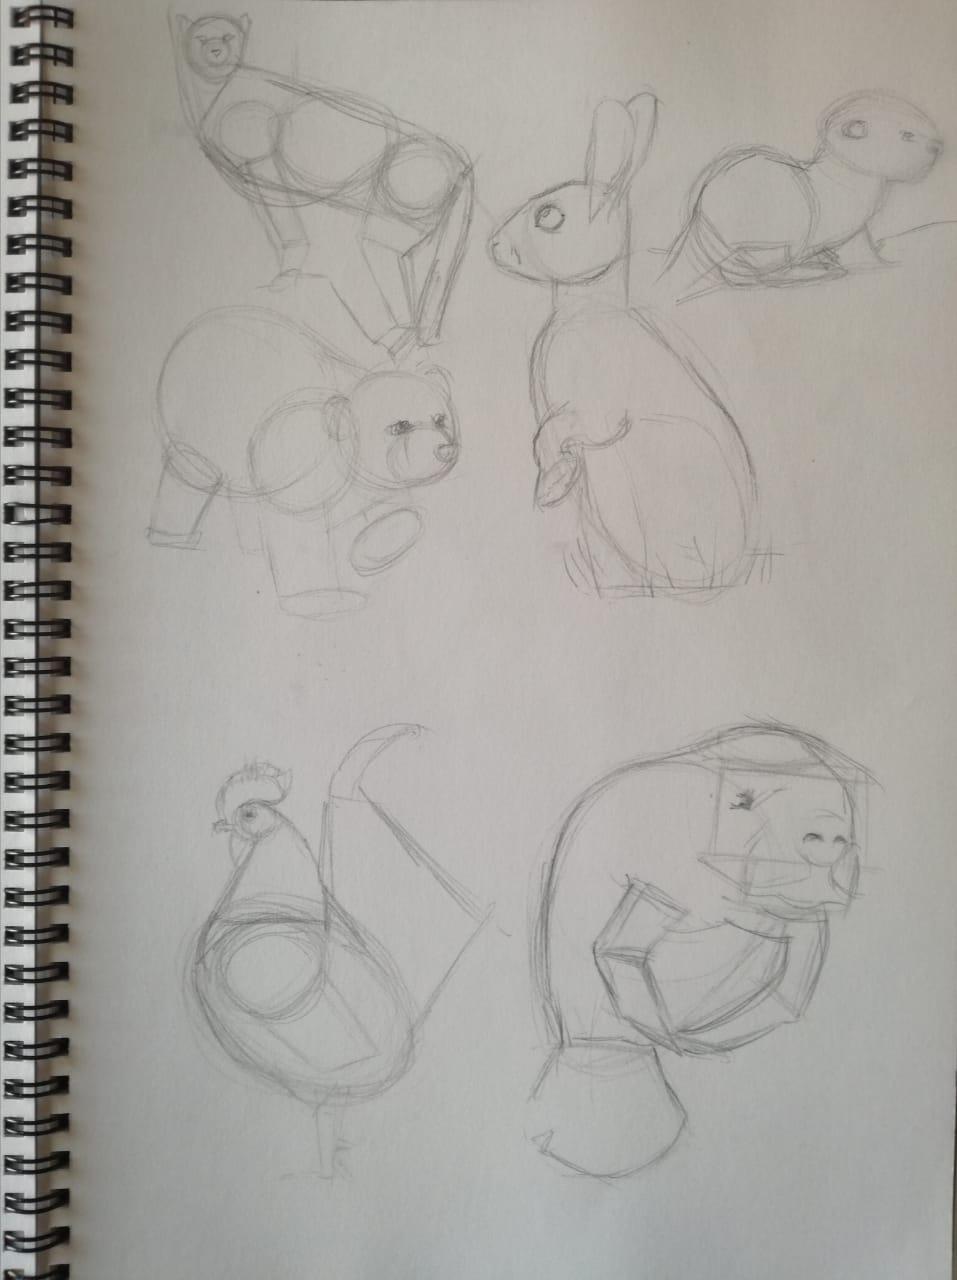 Basic Drawing Skills - image 14 - student project